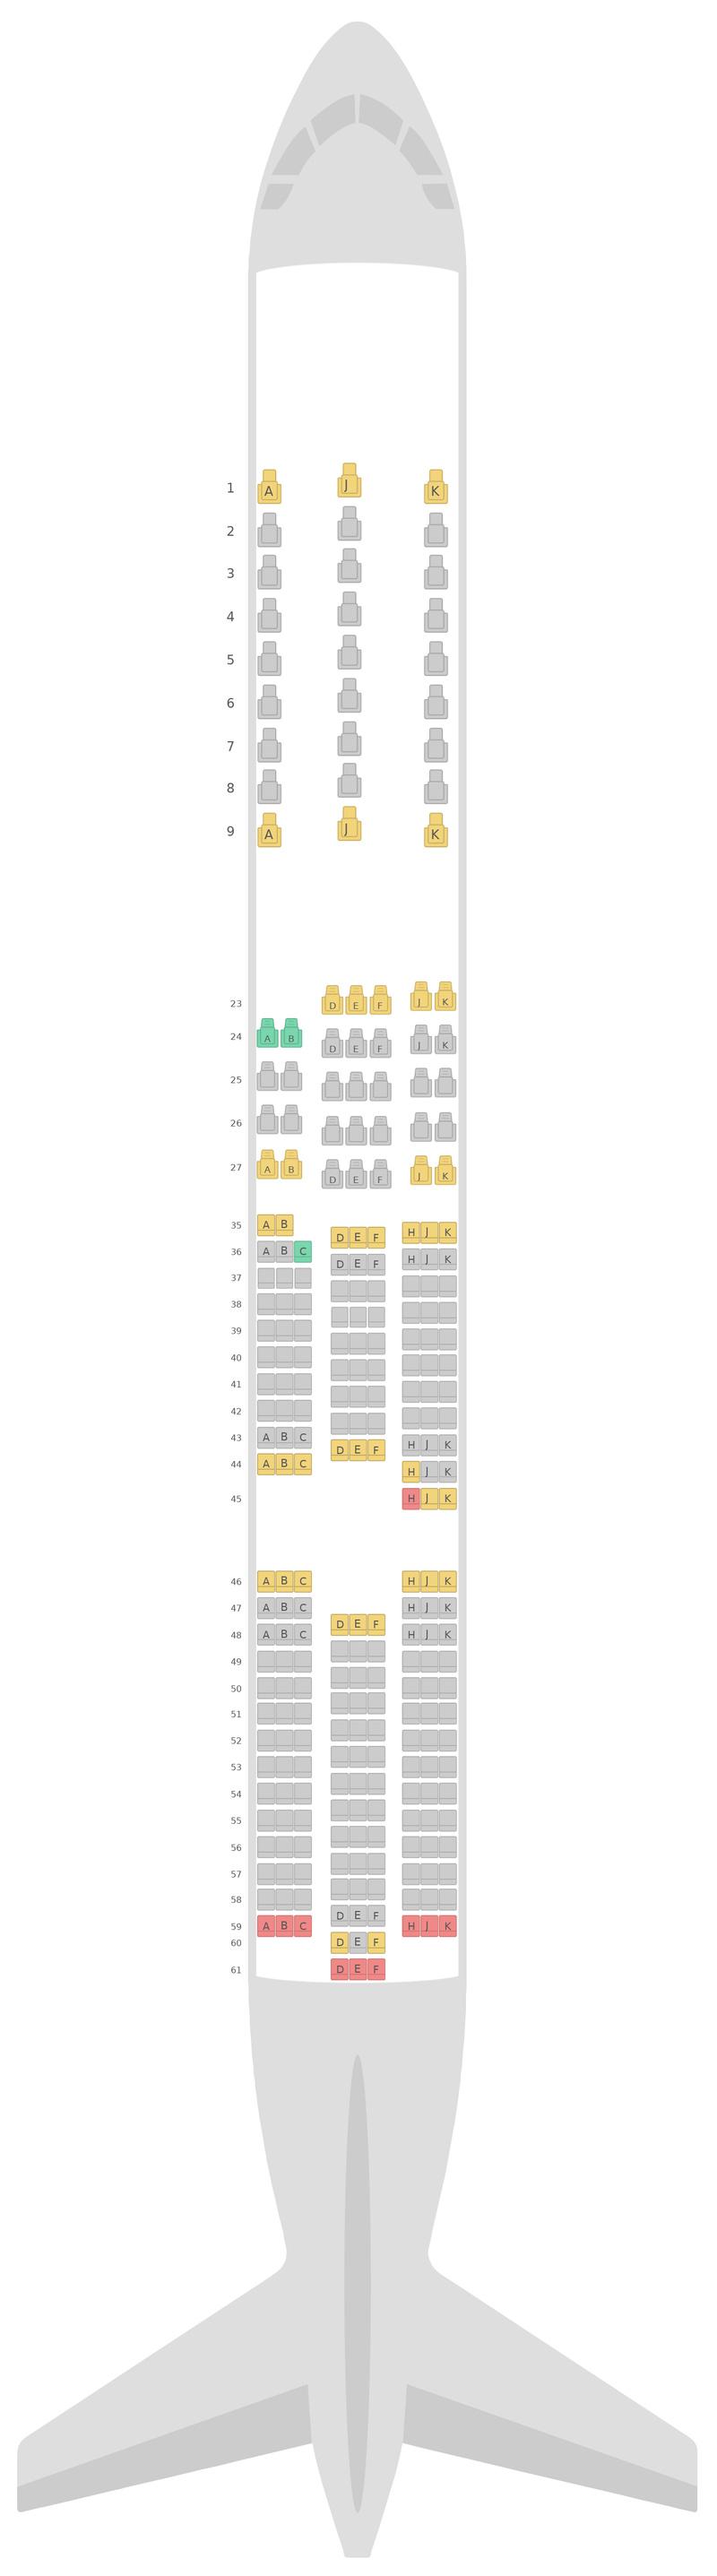 Схема салона Боинг 787-9 (789) v2 Air New Zealand